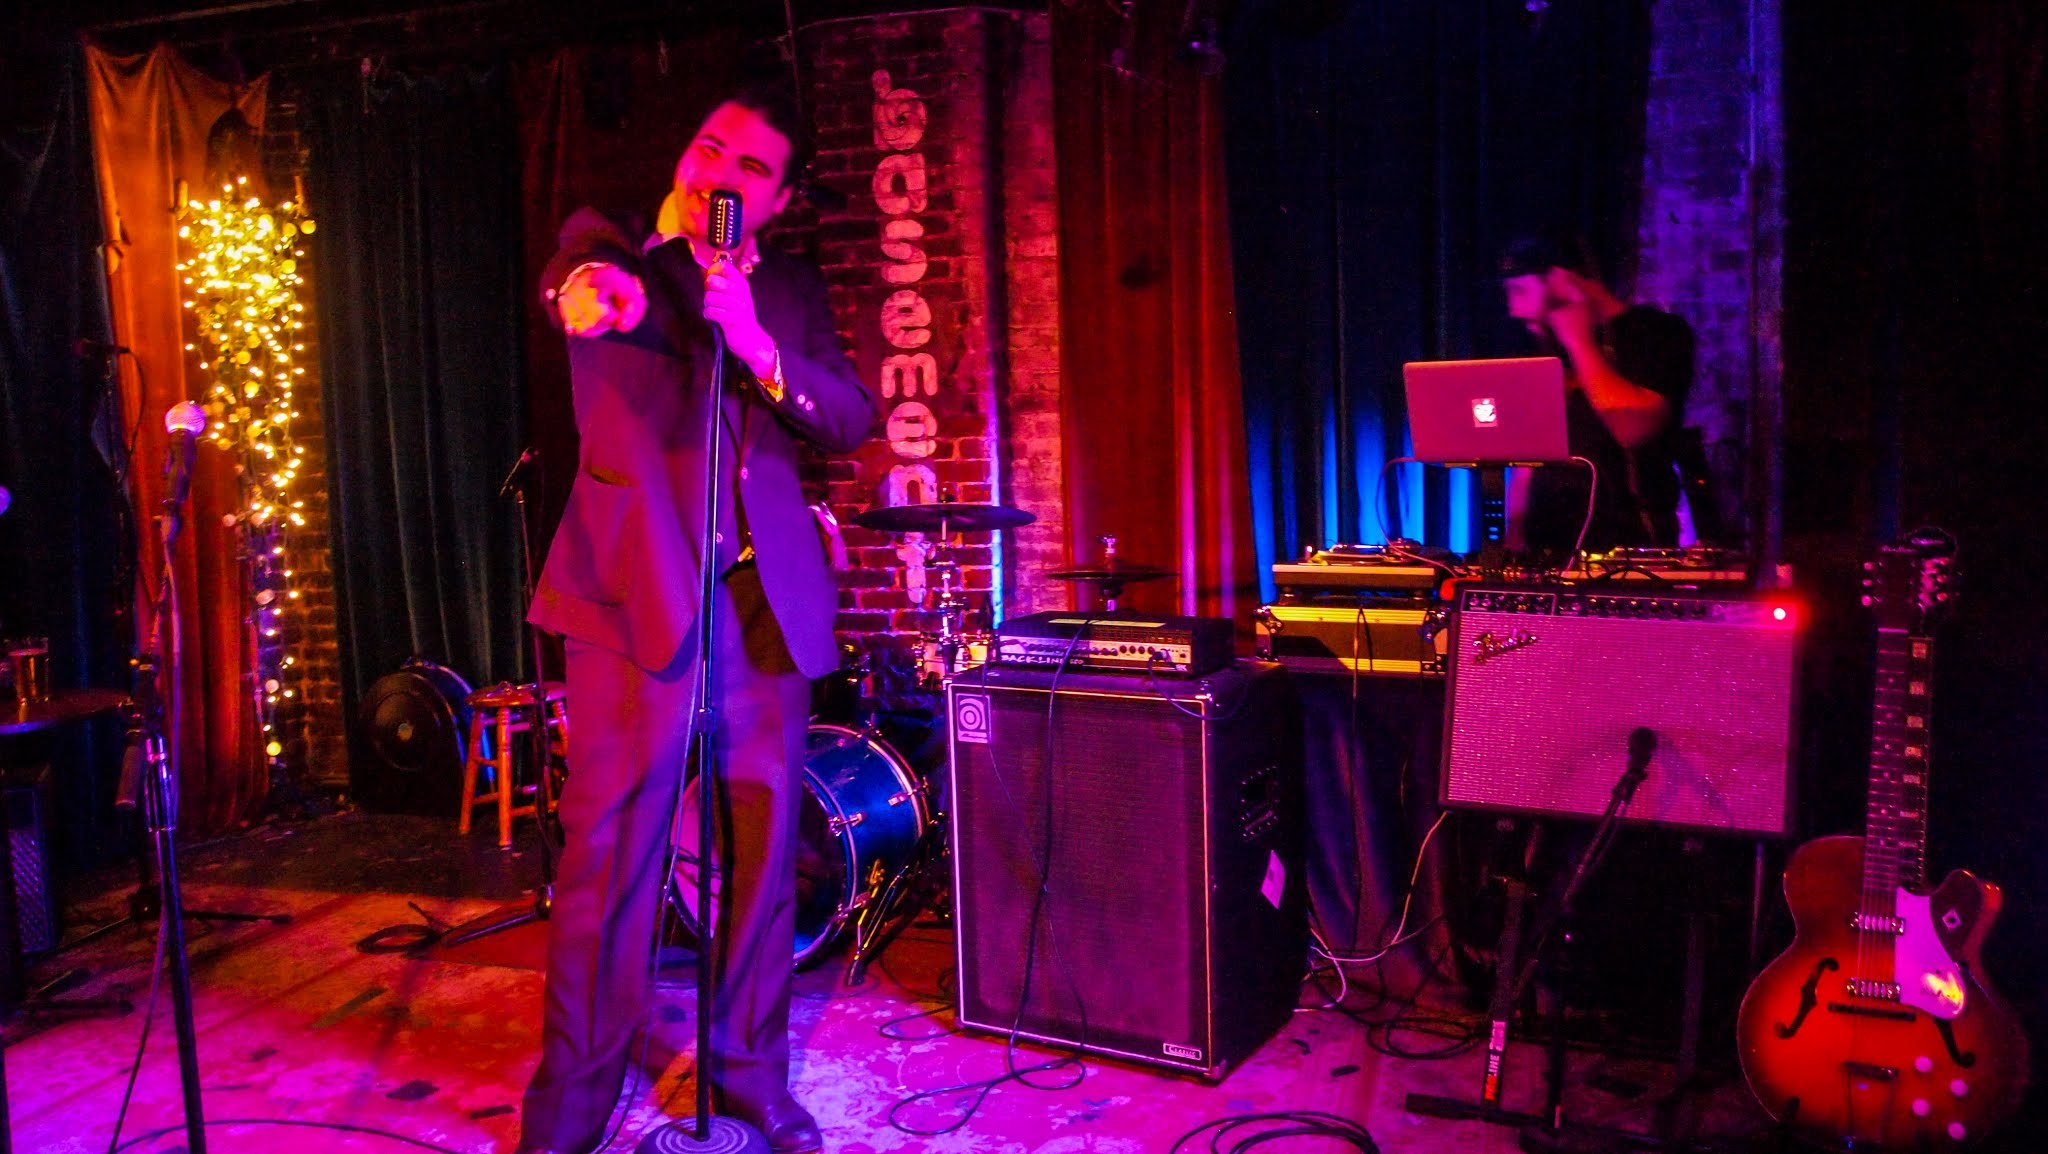 Wally Clark DJ Rate Basement Nashville Live